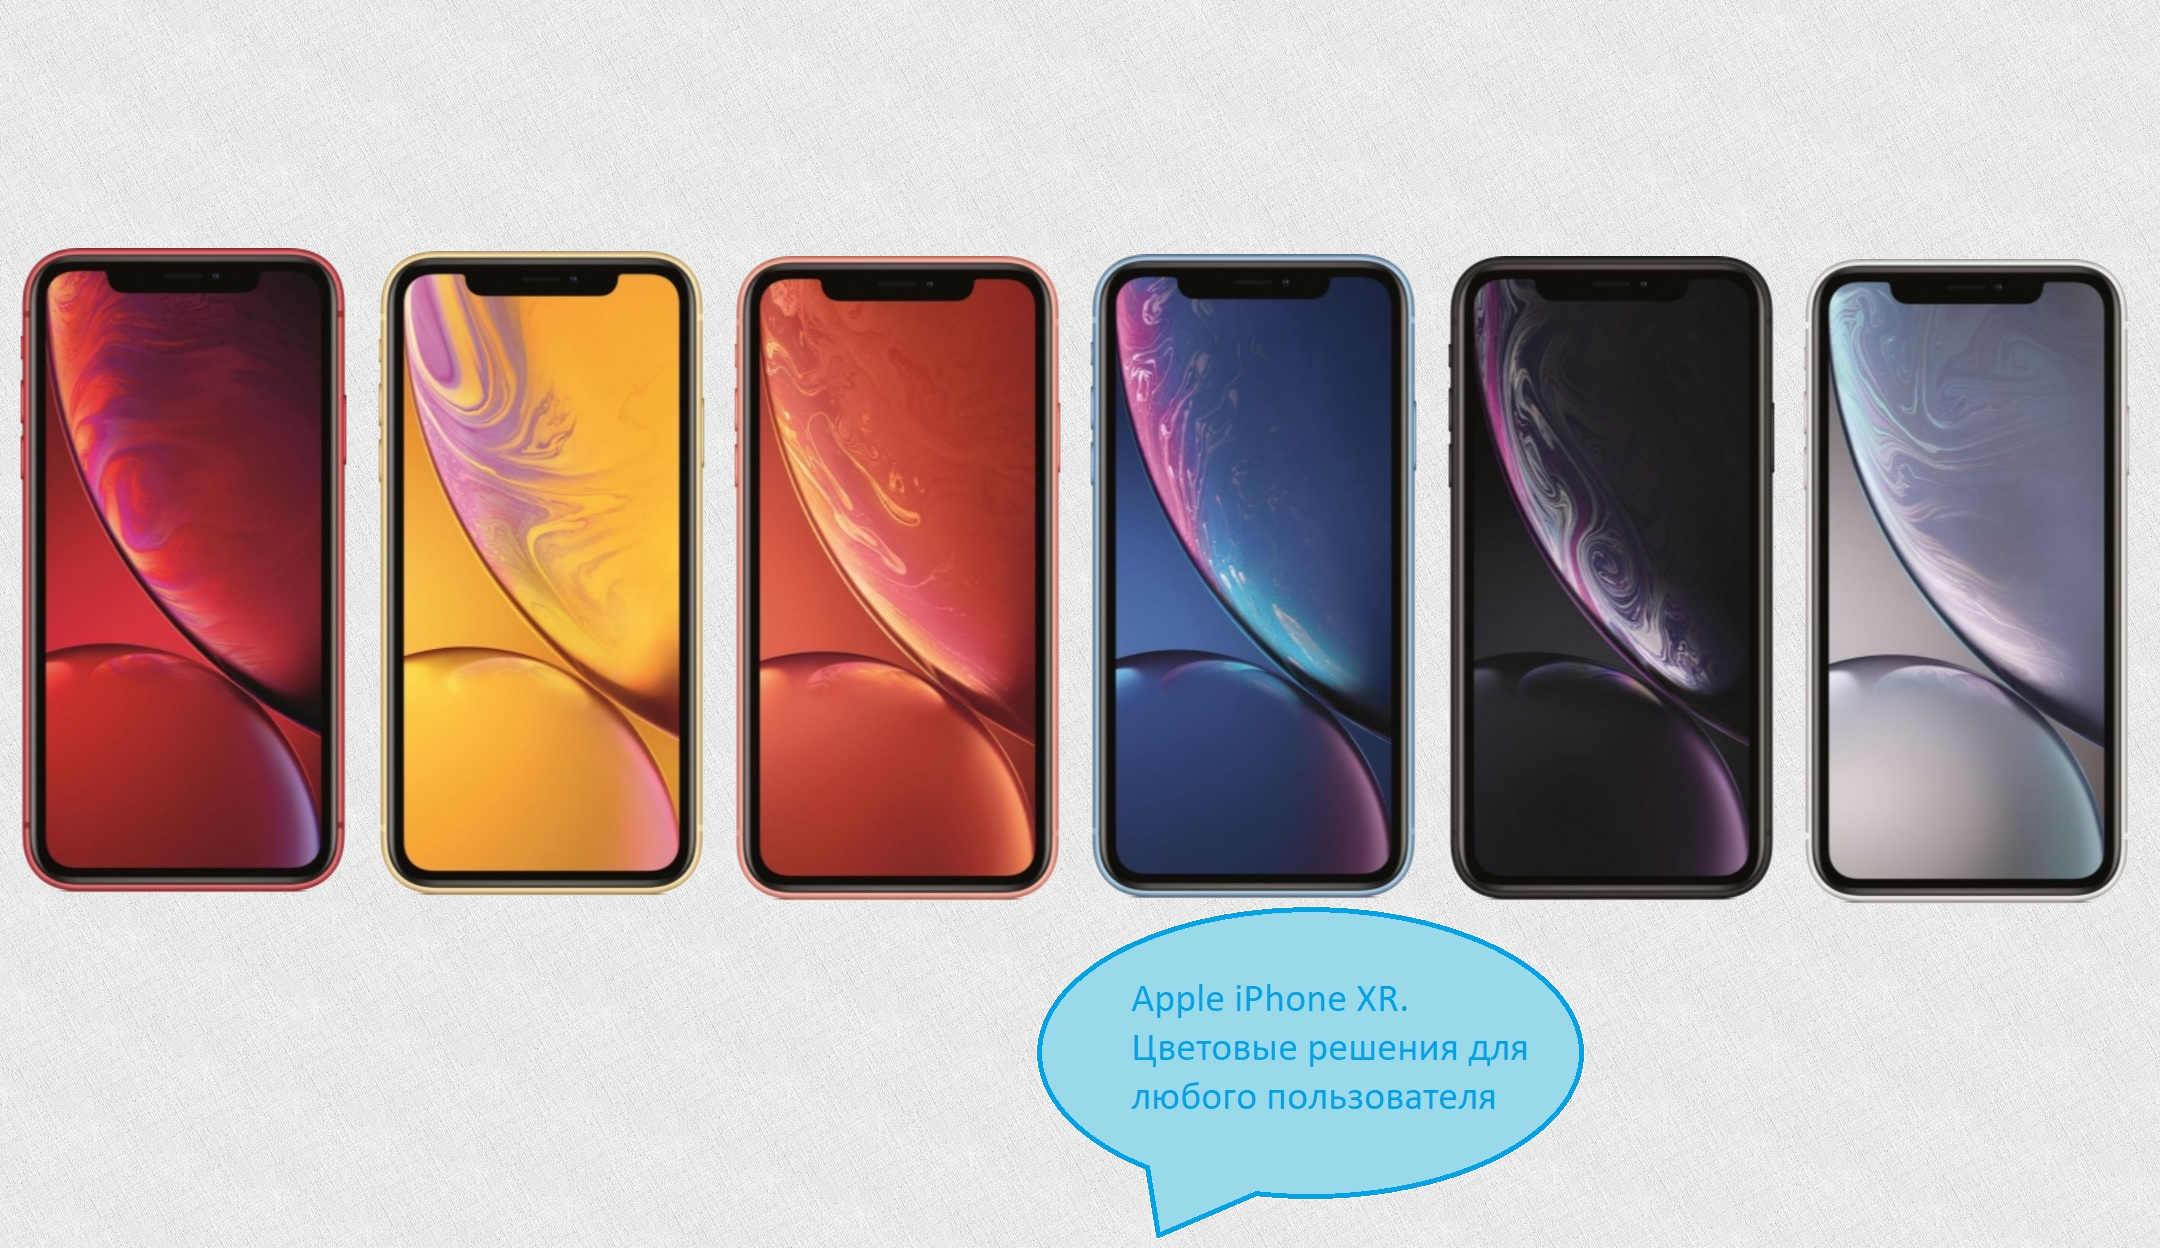 iphone XR цветовые решения